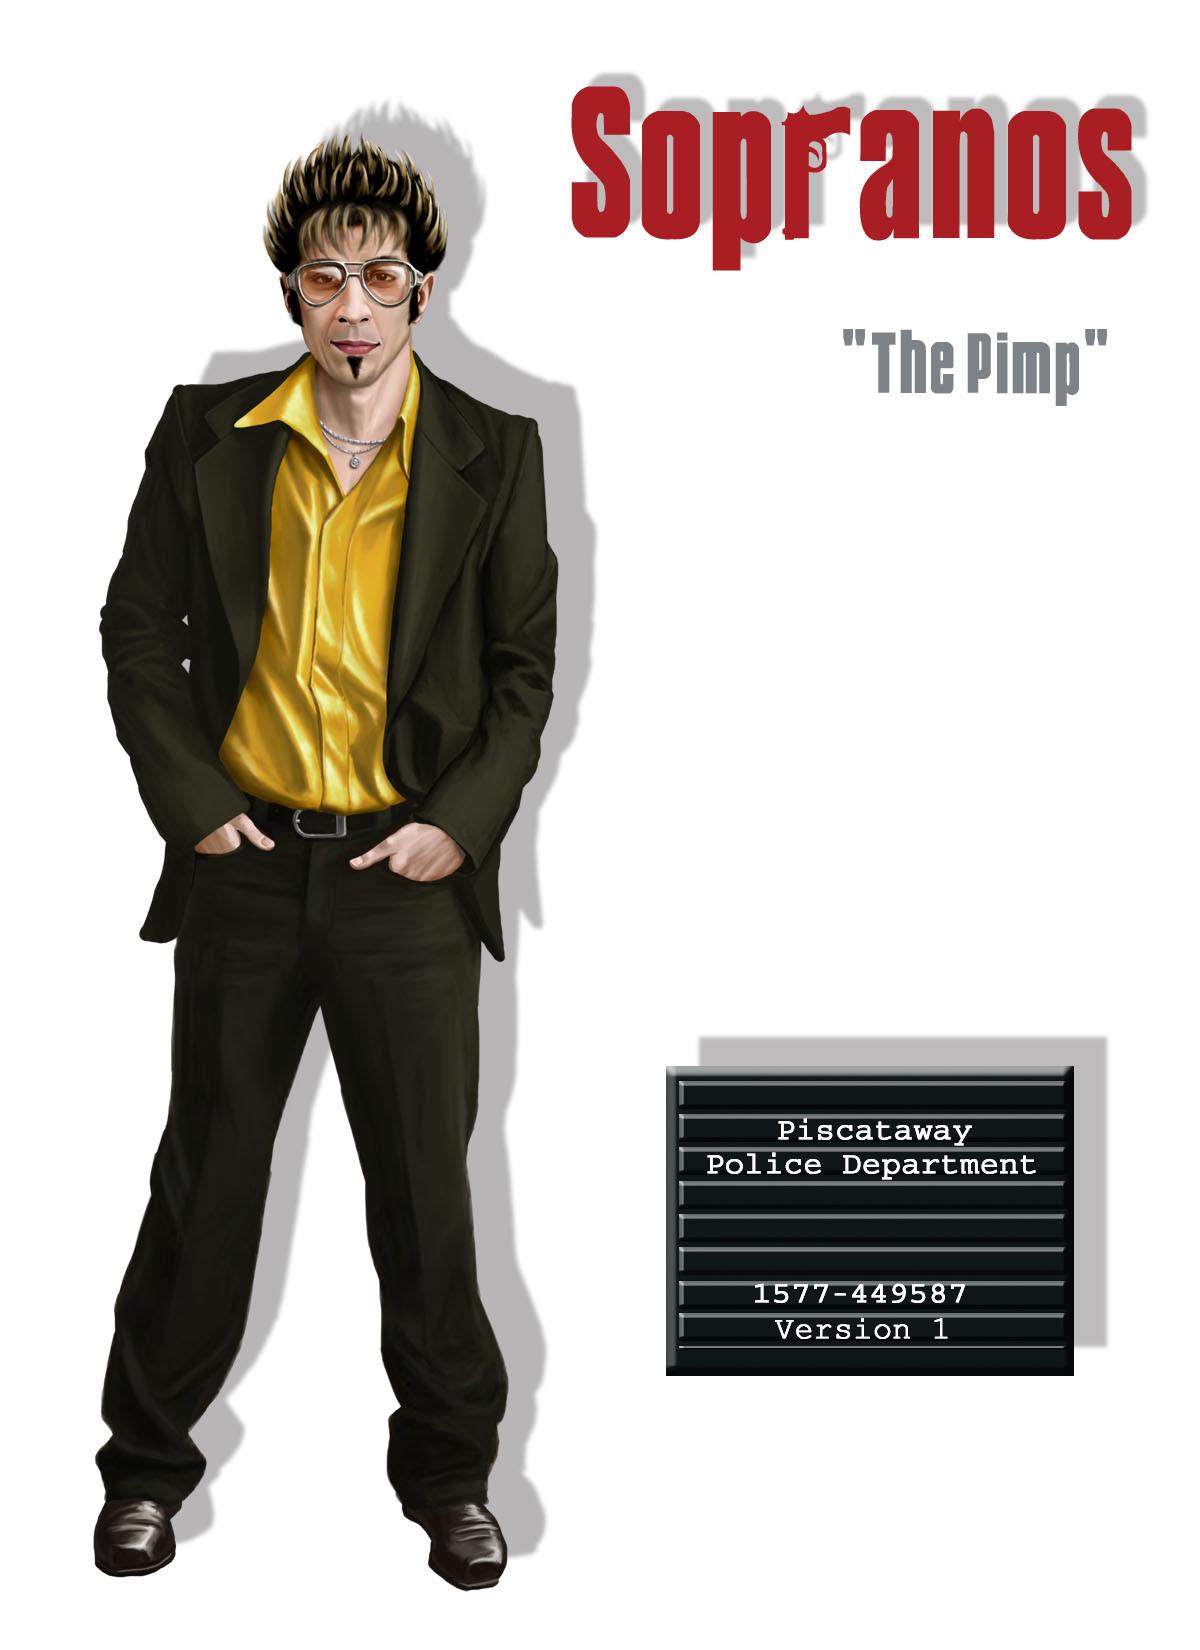 Jeff zugale sop 2nd pimp concept v1